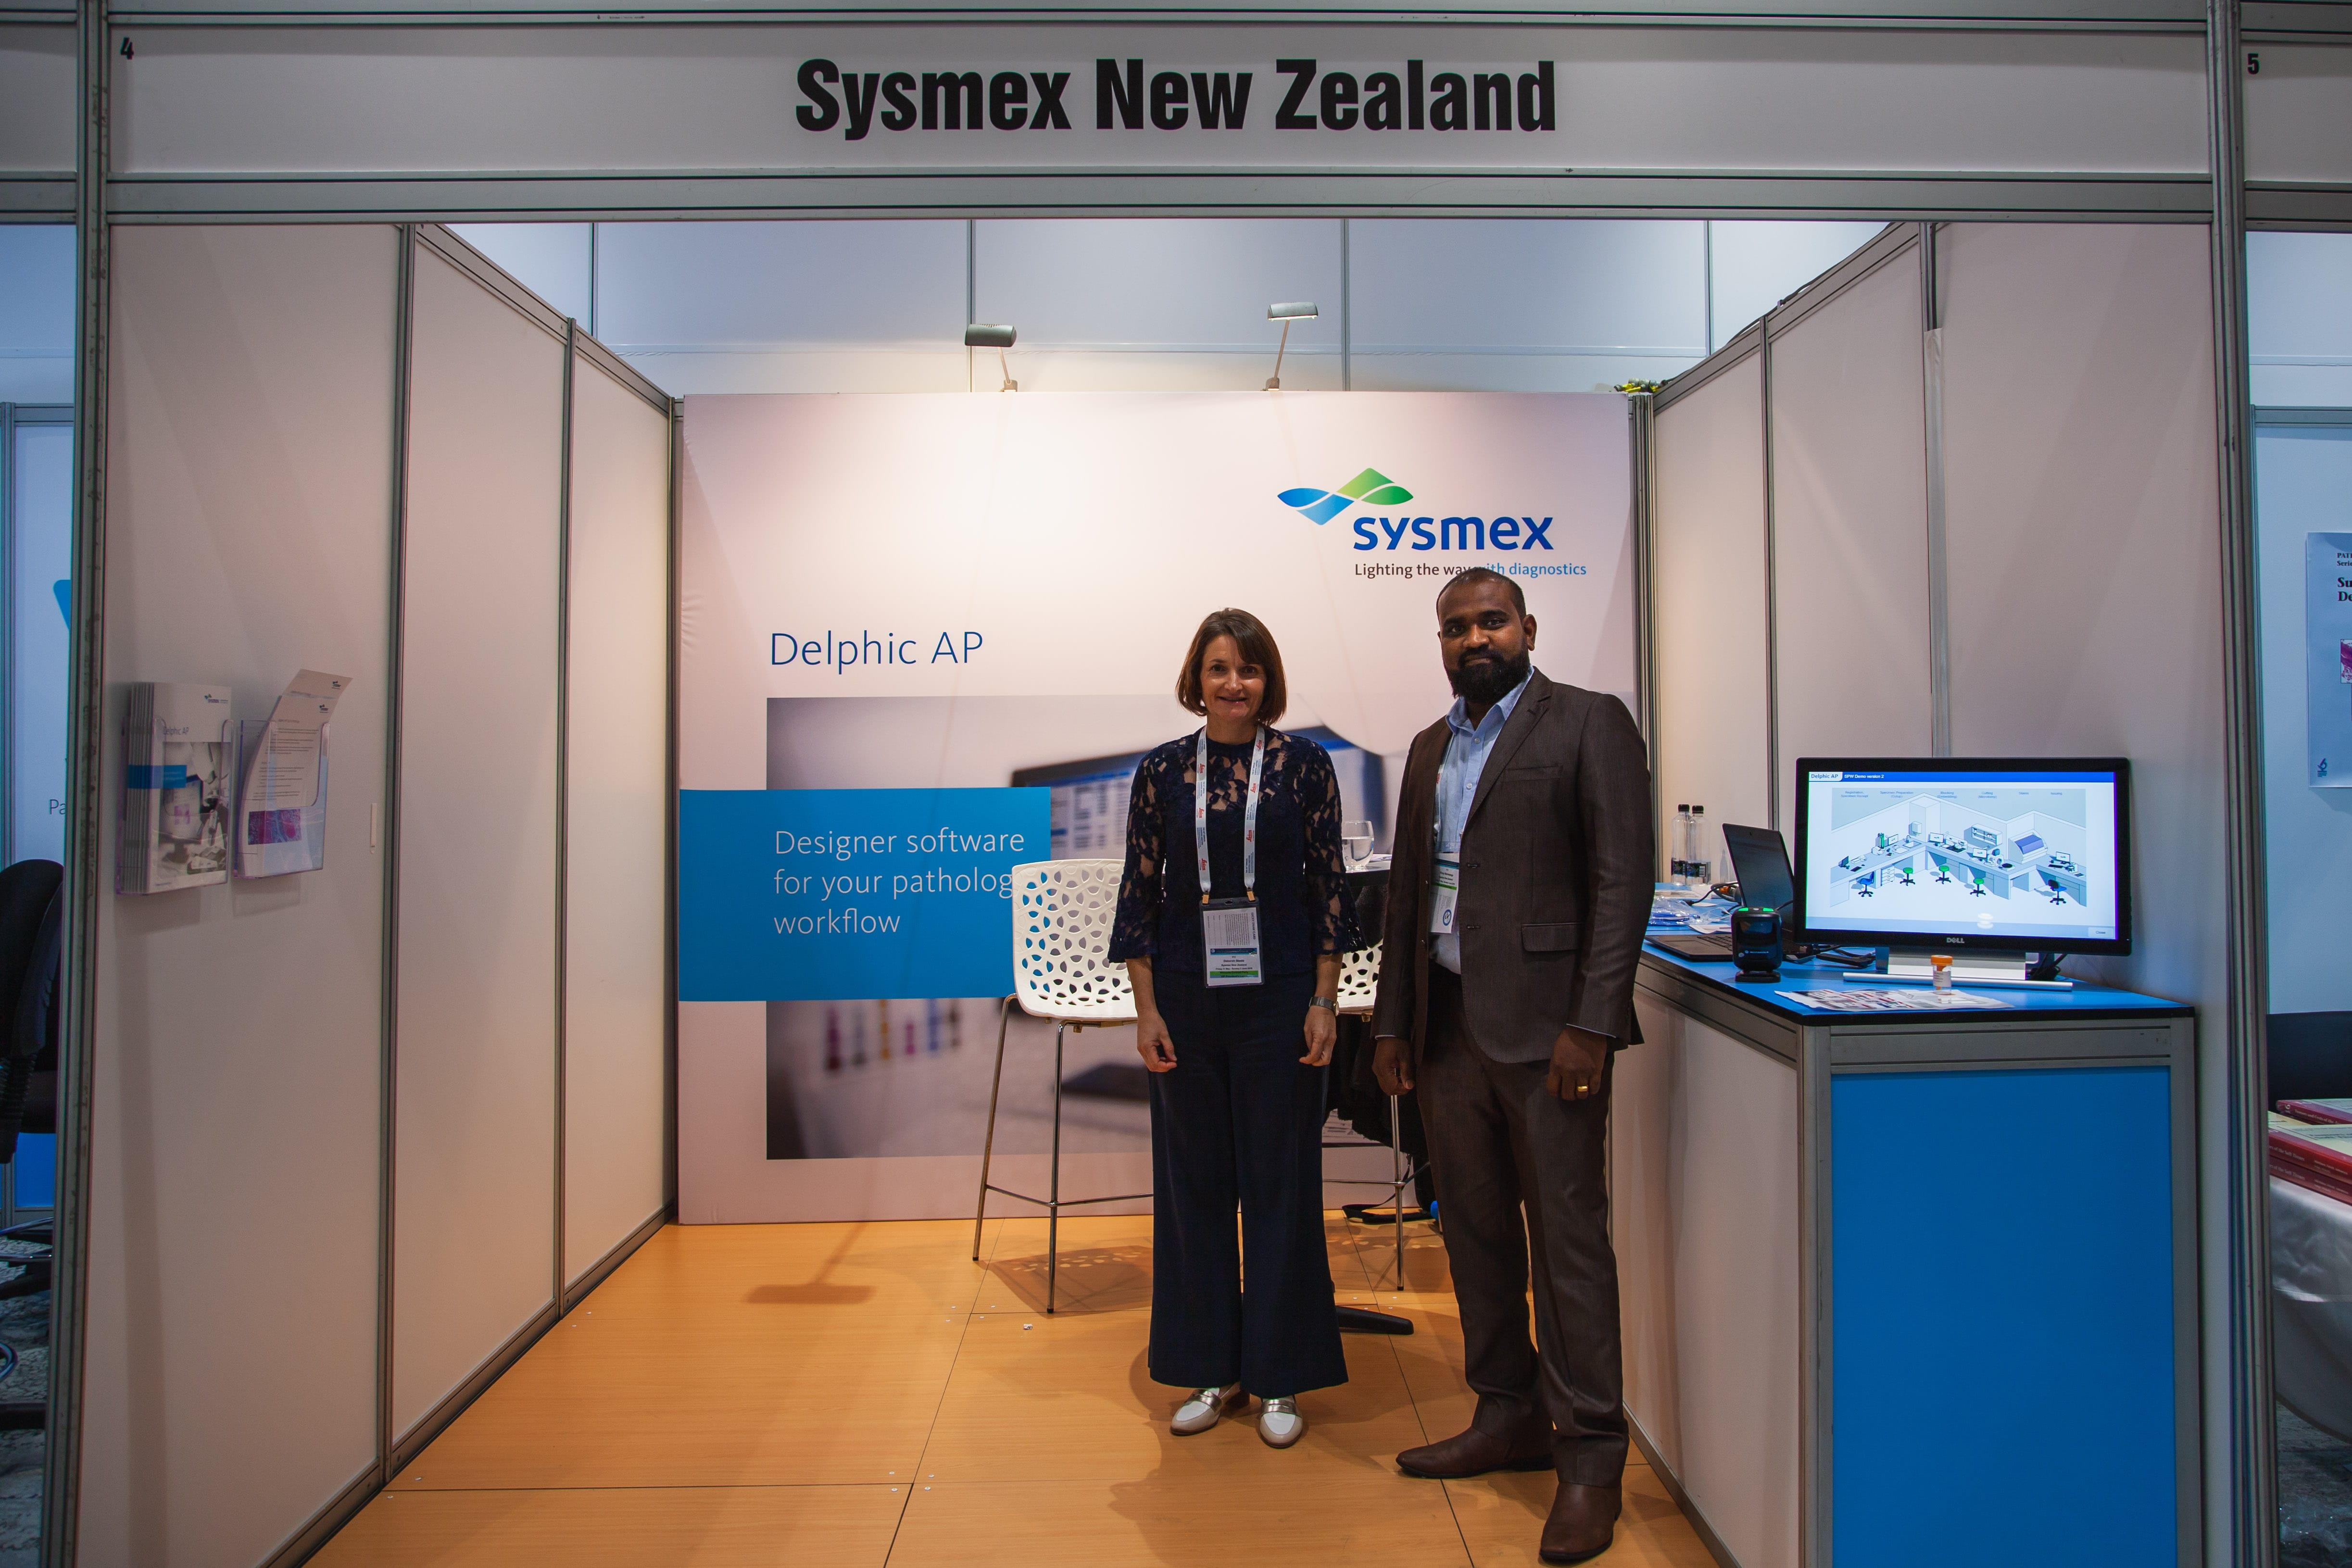 Sysmex NZ- Exhibitor